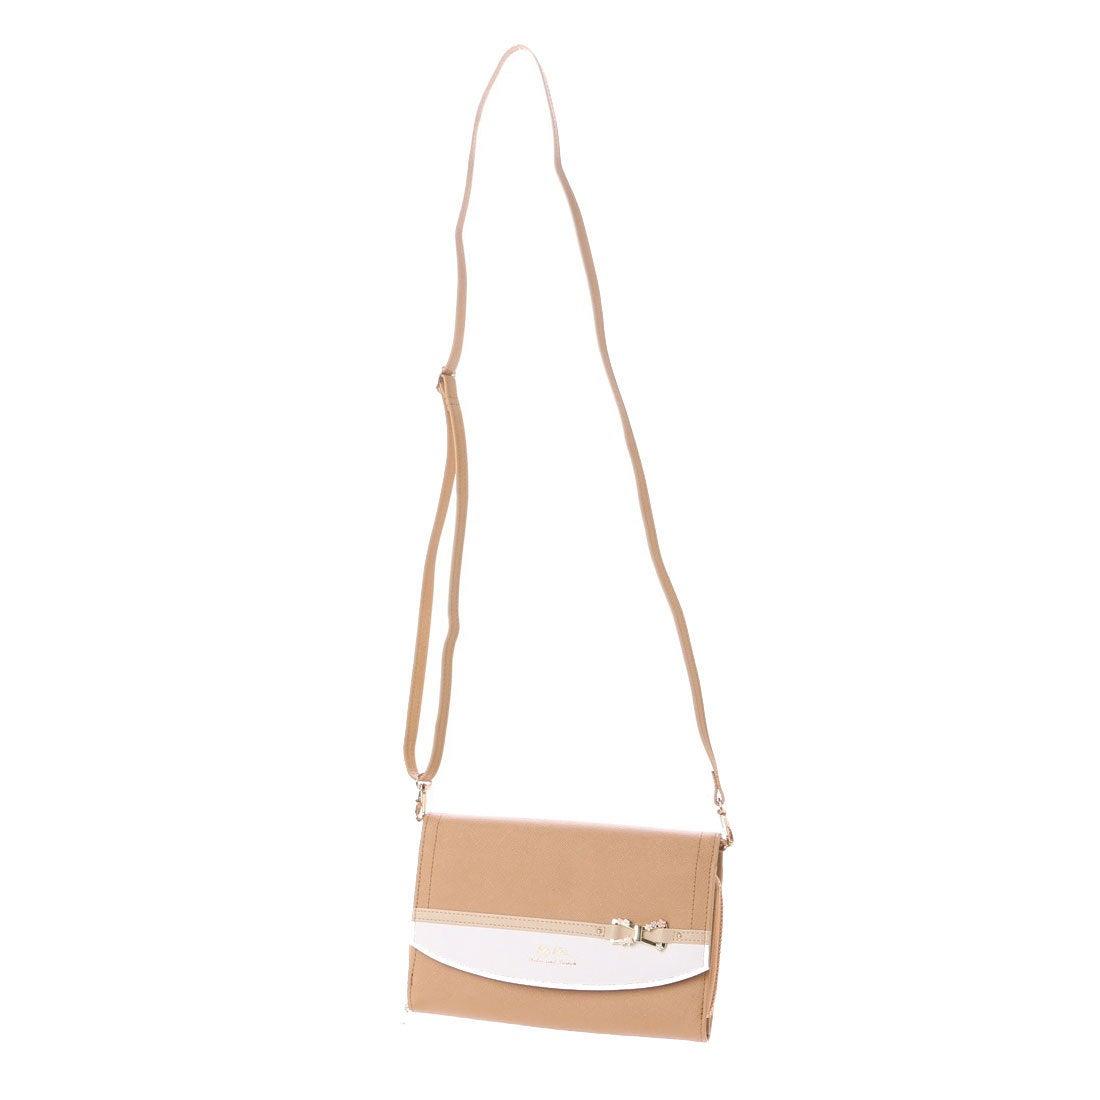 【SALE 50%OFF】リズリサ LIZ LISA リズリサ LIZ LISA ティー リボン金具使い配色お財布ポシェット (ブラウン) レディース